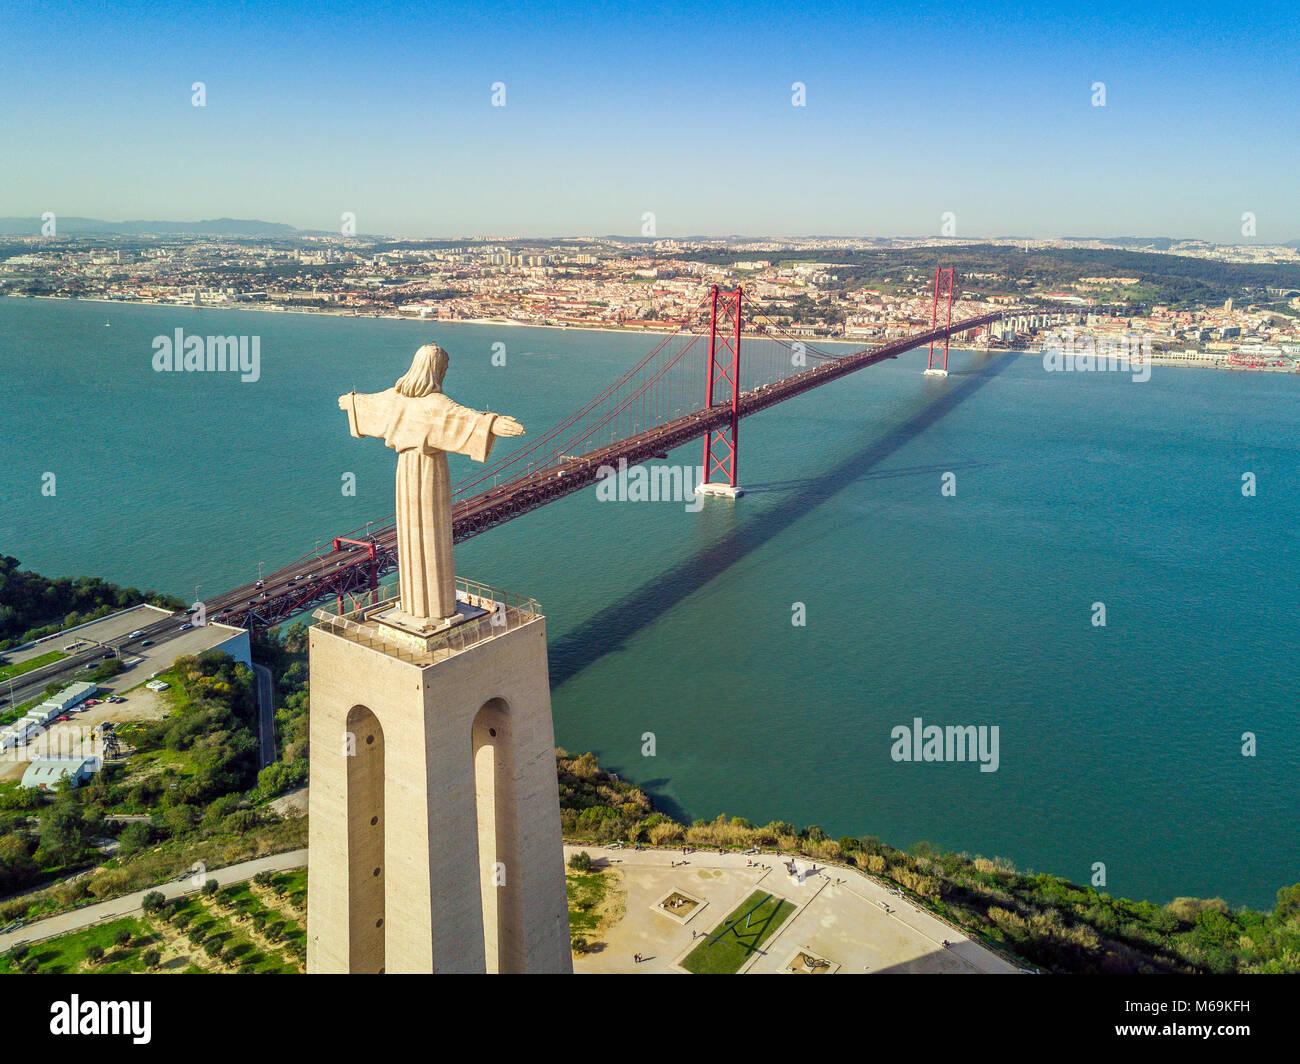 Jesus Christus Denkmal von Tejo in Lissabon, Portugal Stockbild